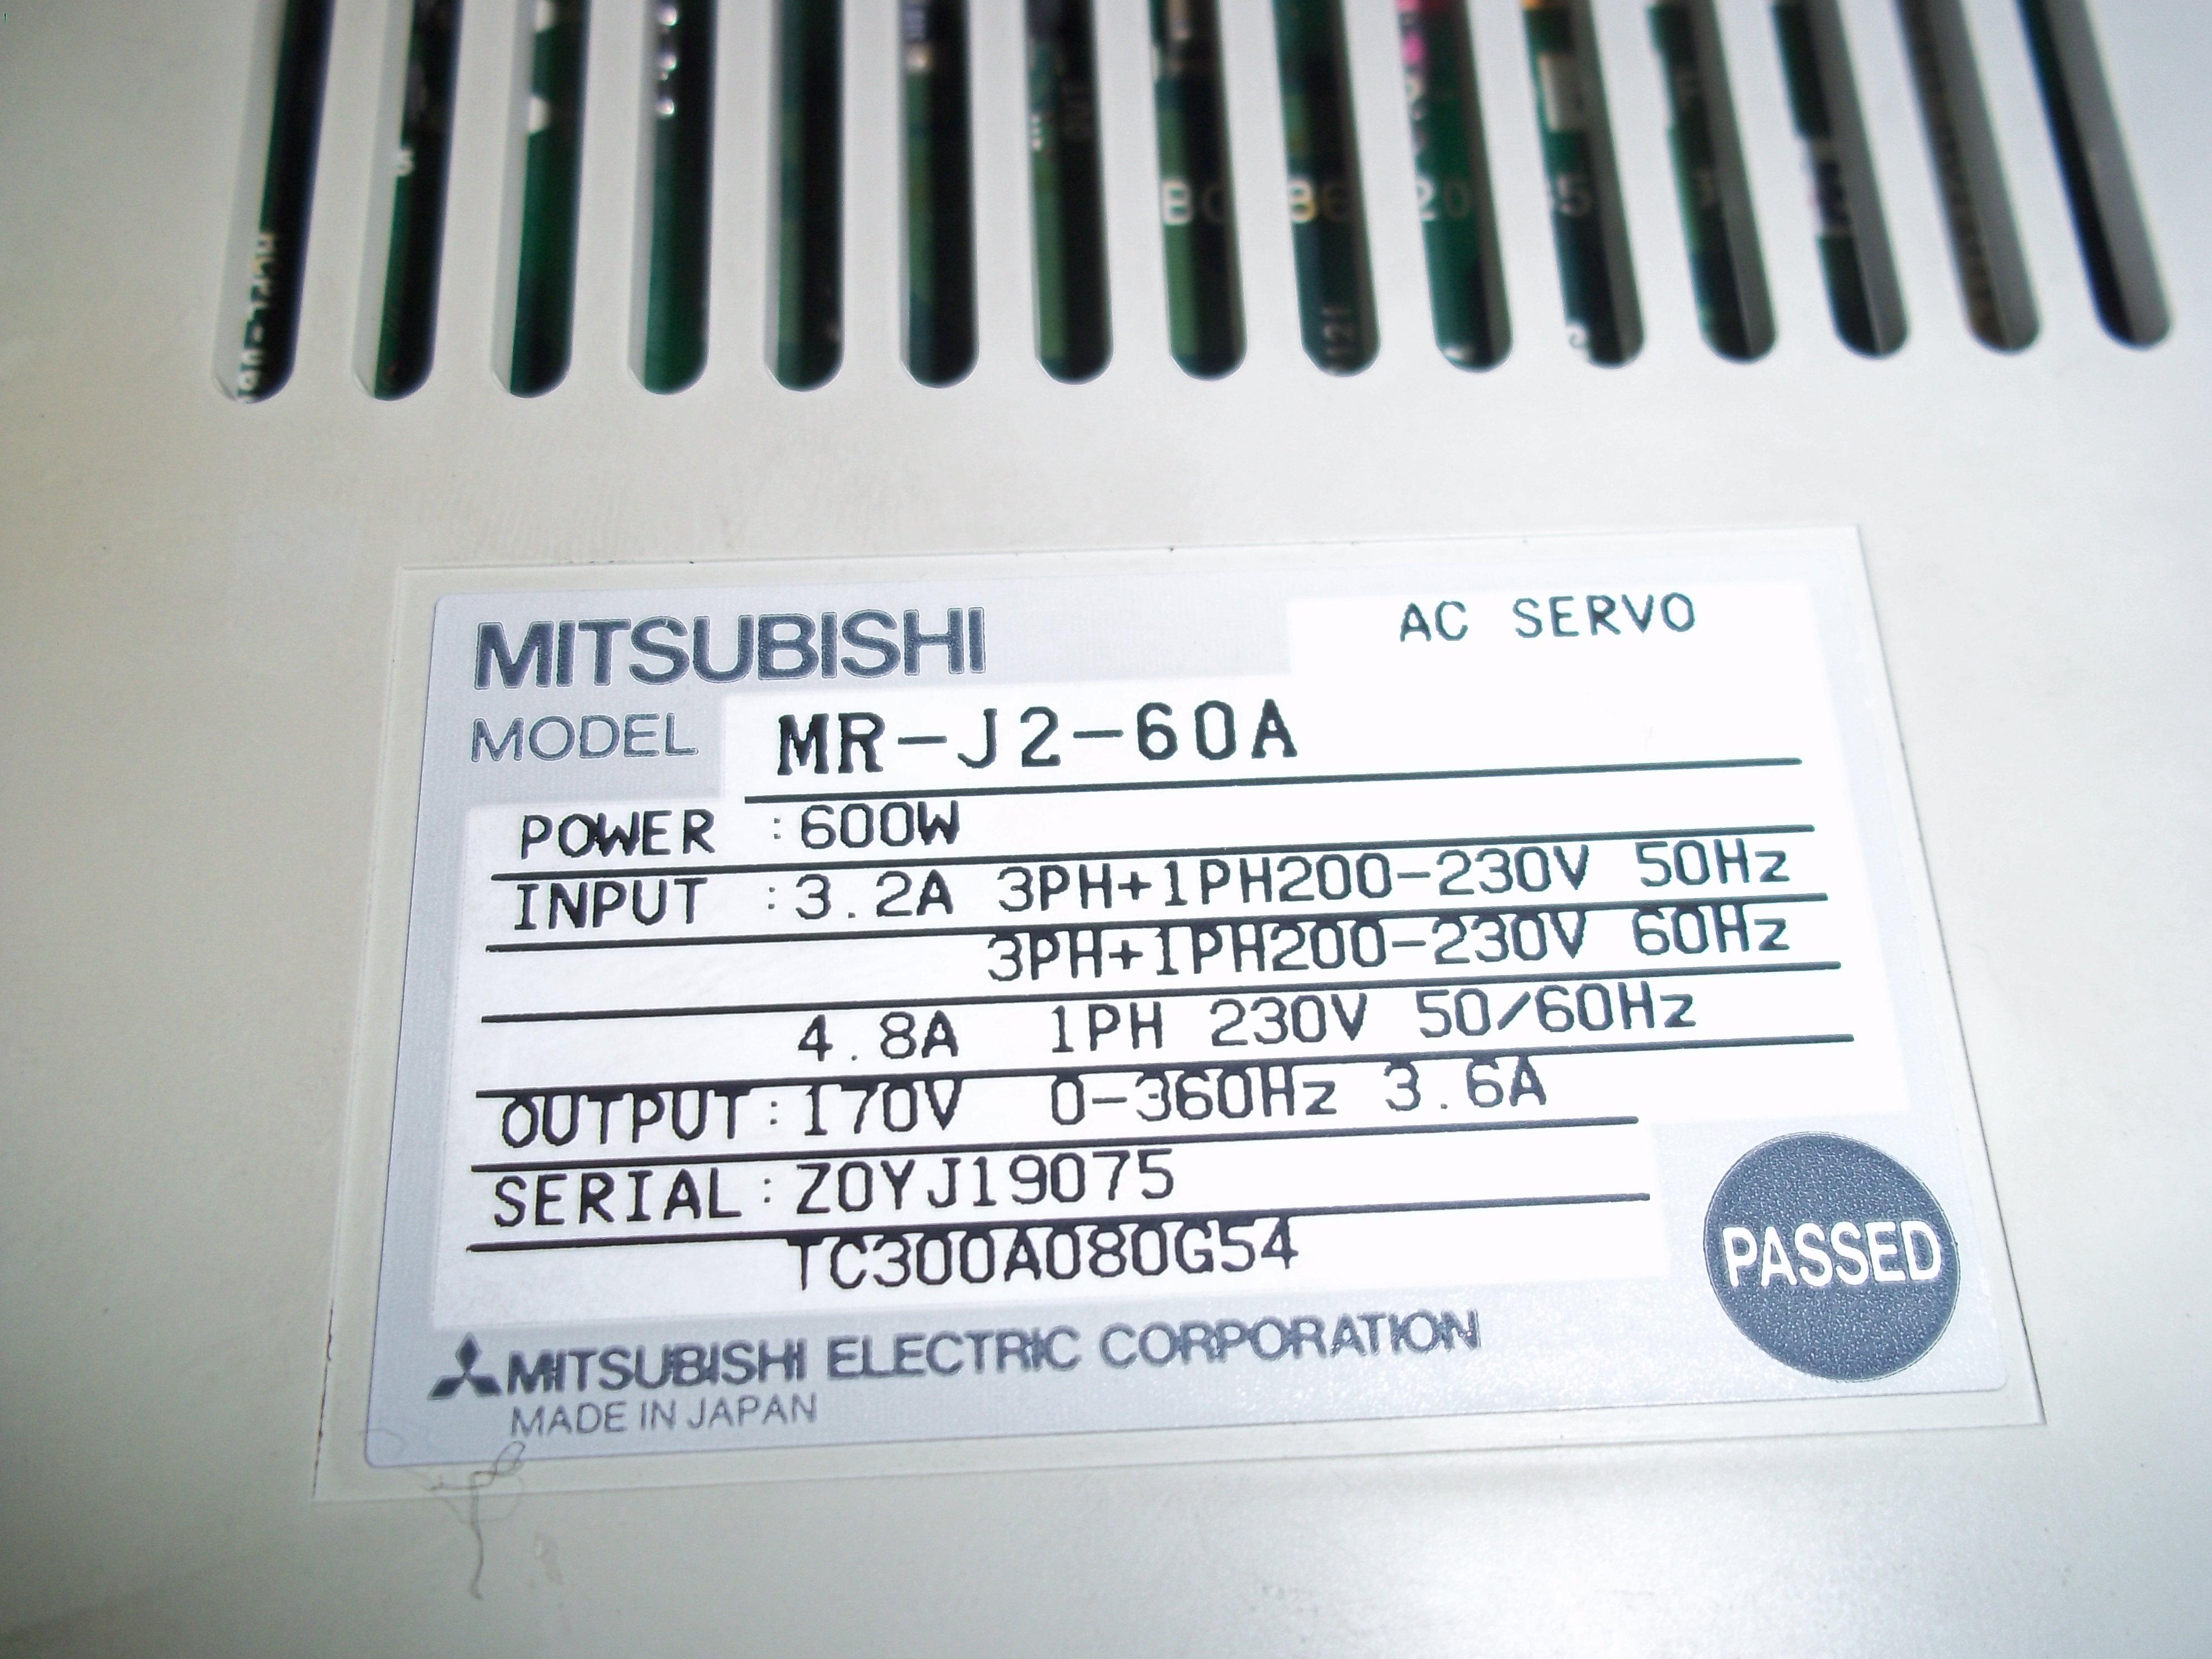 Repair MR-J2-60A MITSUBISHI MITSUBISHI AC SERVO in Malaysia, Singapore, Thailand, Indonesia